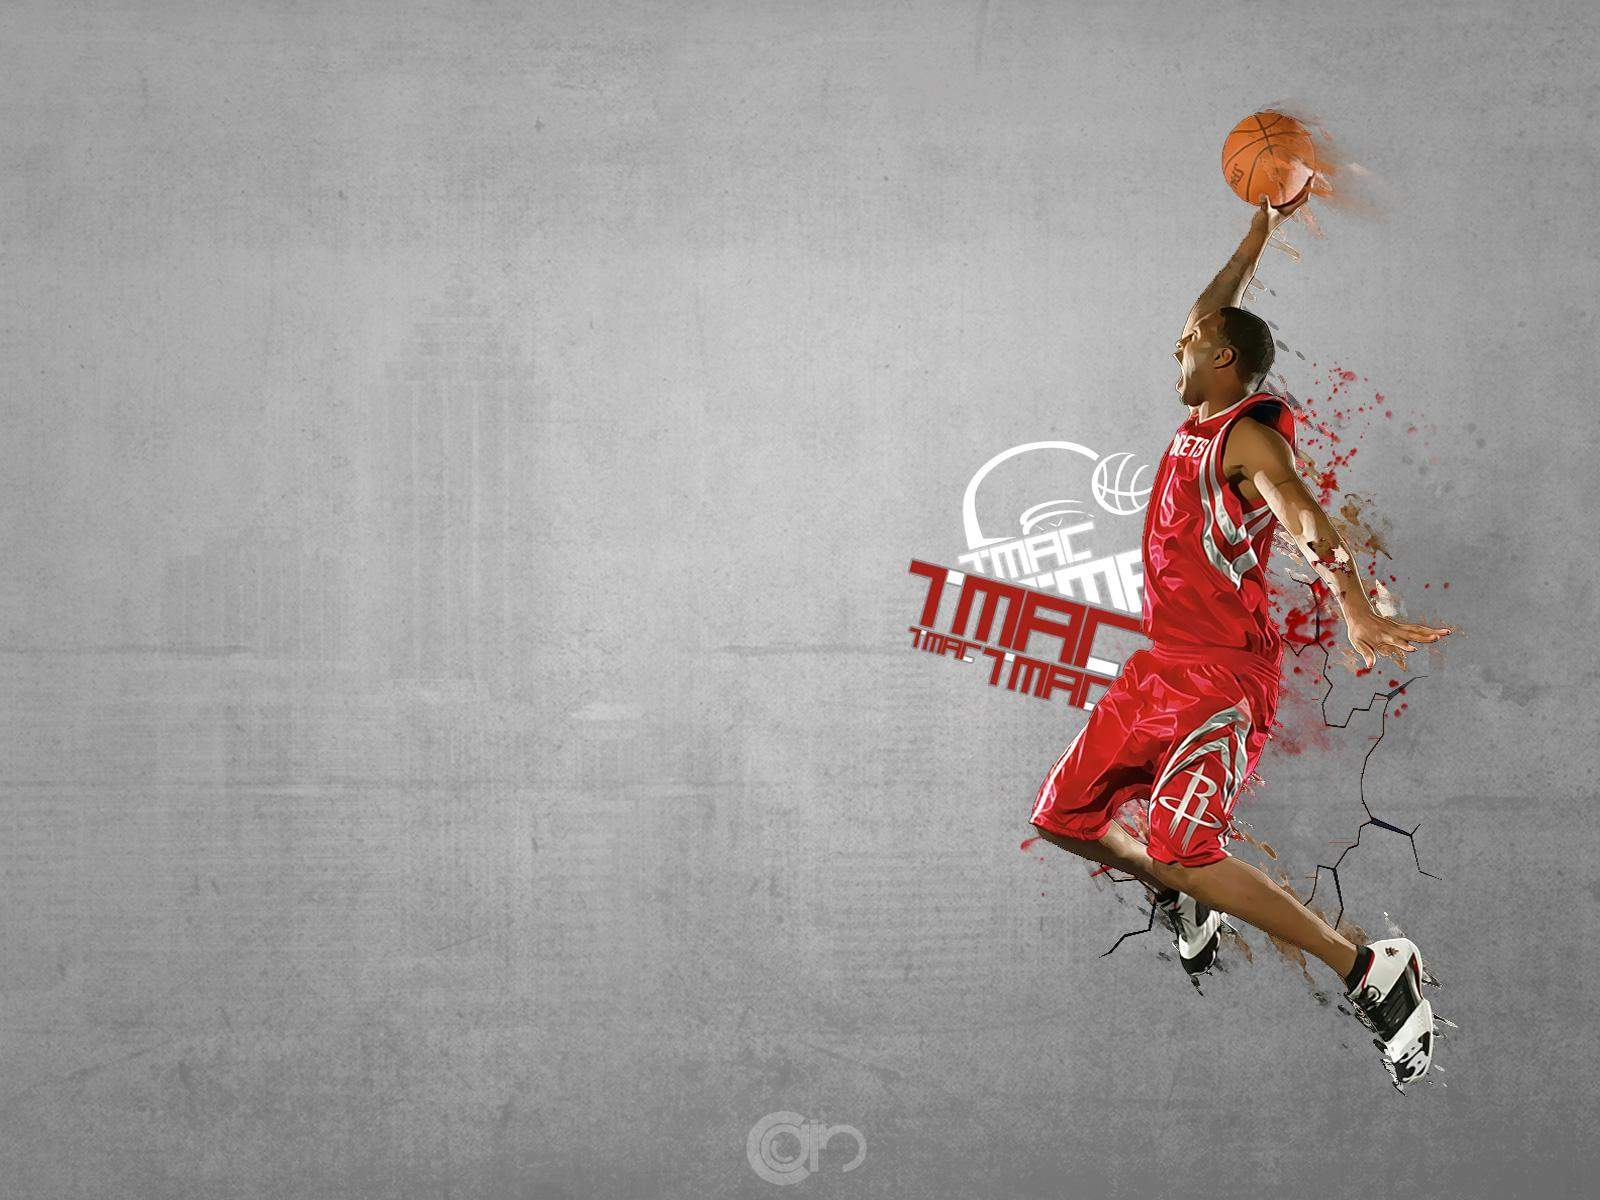 http://3.bp.blogspot.com/-_JU5PeNcAp0/T9GytgUYIMI/AAAAAAAAEq4/pVnJRNvNiJw/s1600/t-mac-slam-dunk-basketball-sport-wallpapers.jpg